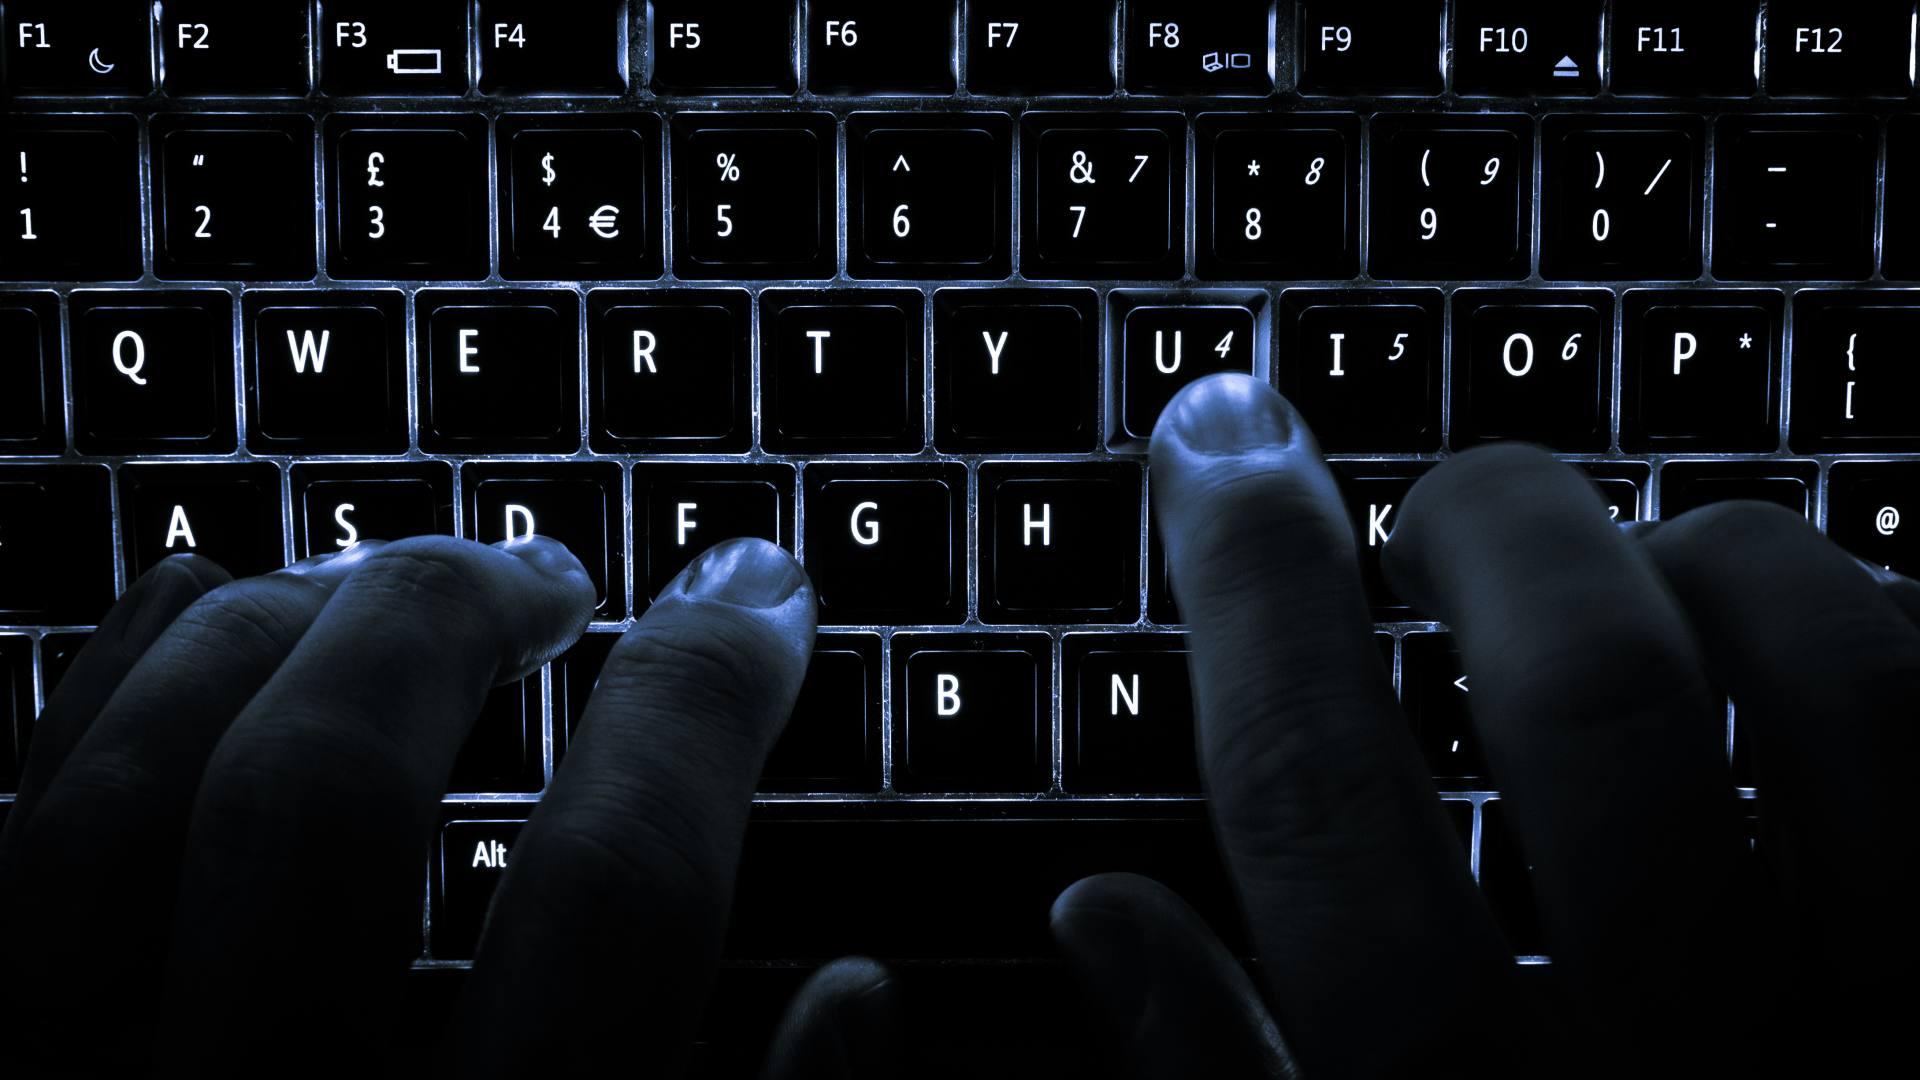 Backlit-keyboard